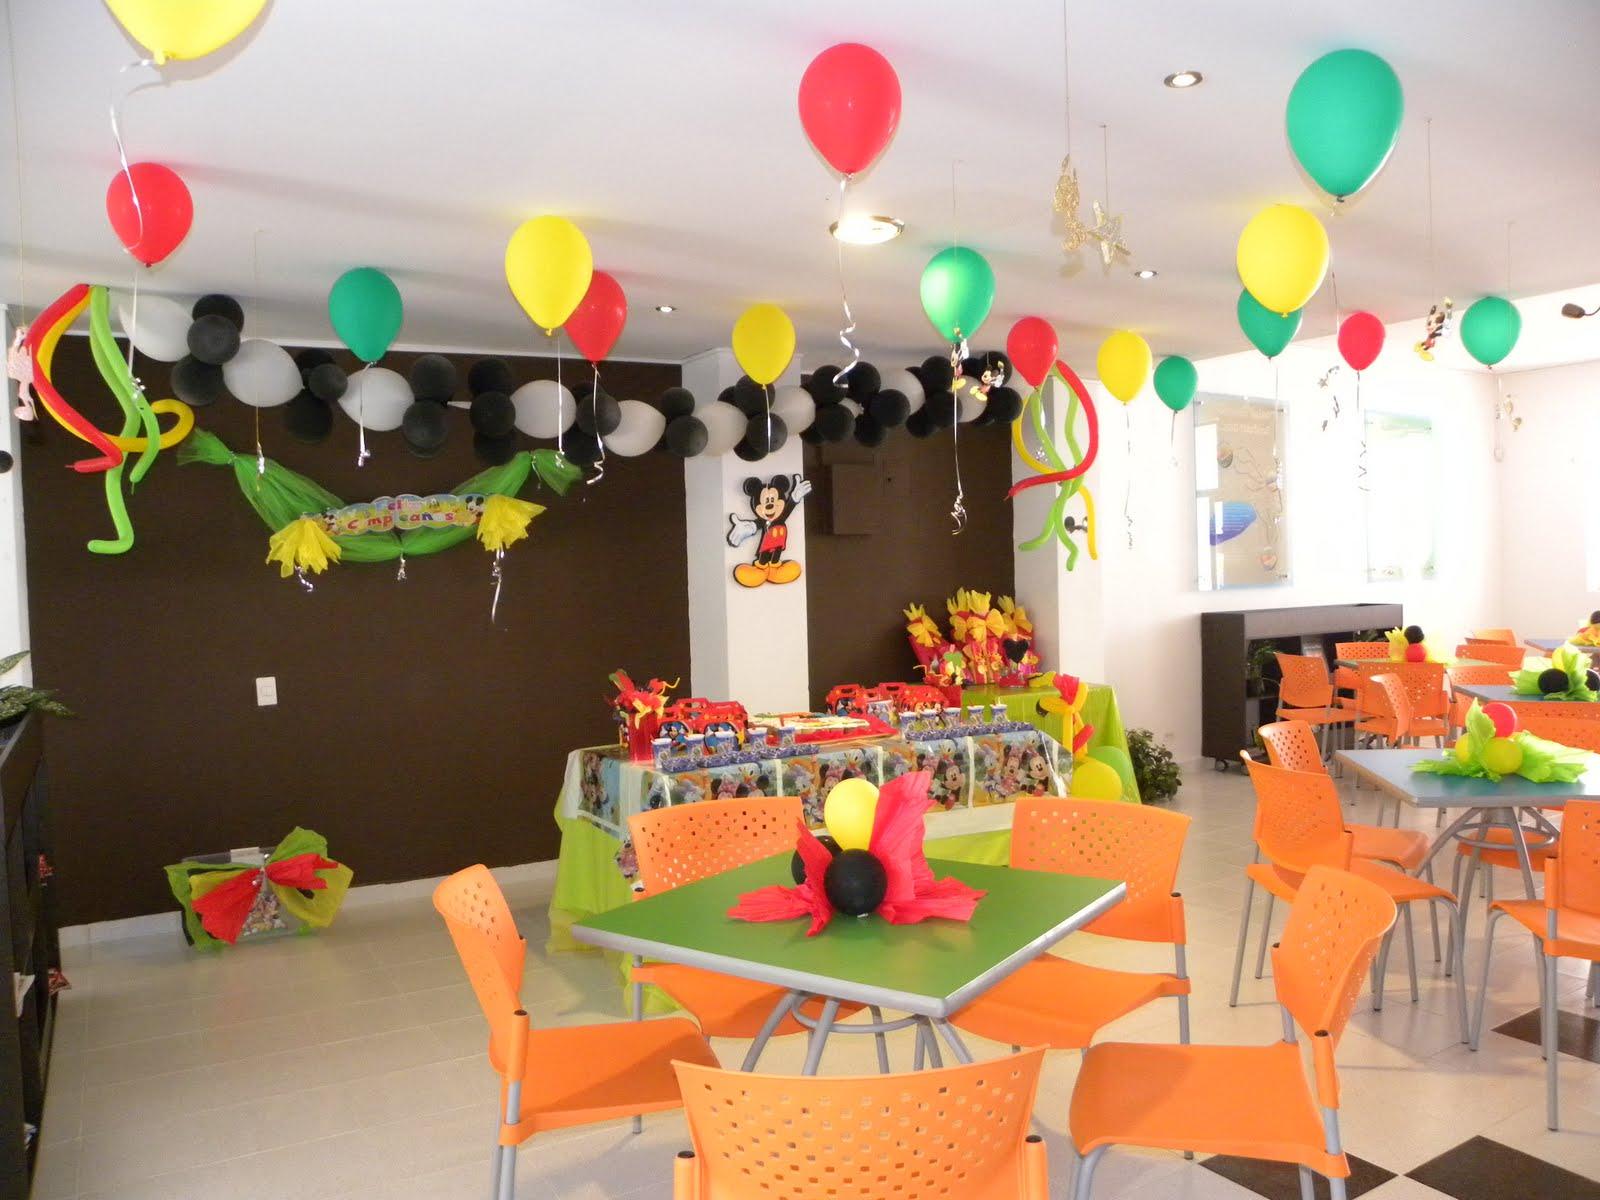 Celebraciones de cumplea os para adultos - Ideas para decorar cumpleanos de adultos ...